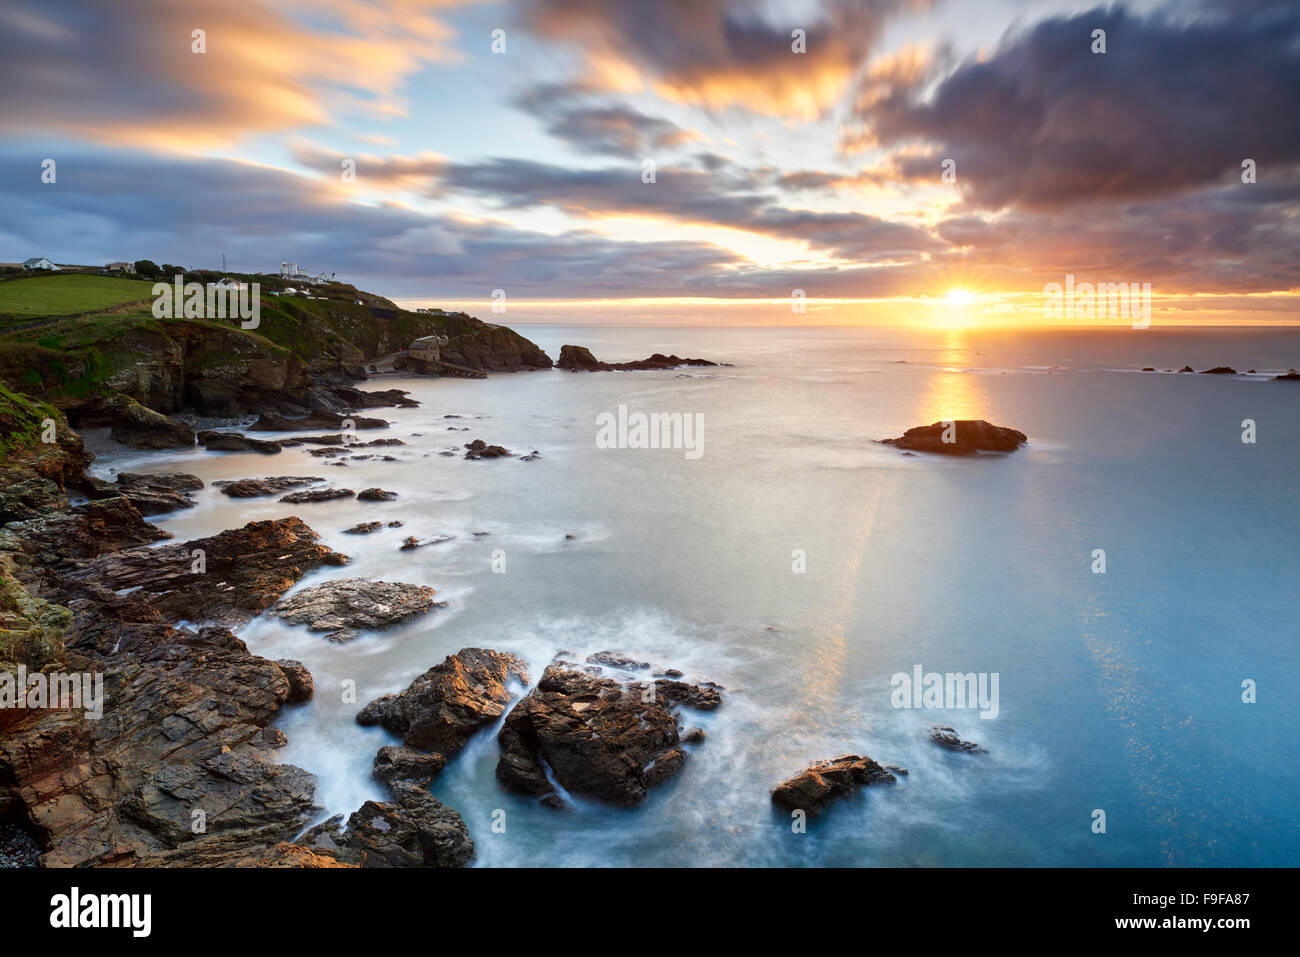 Ein Winter-Sonnenaufgang über dem Polpeor Cove, The Lizard Cornwall Stockbild